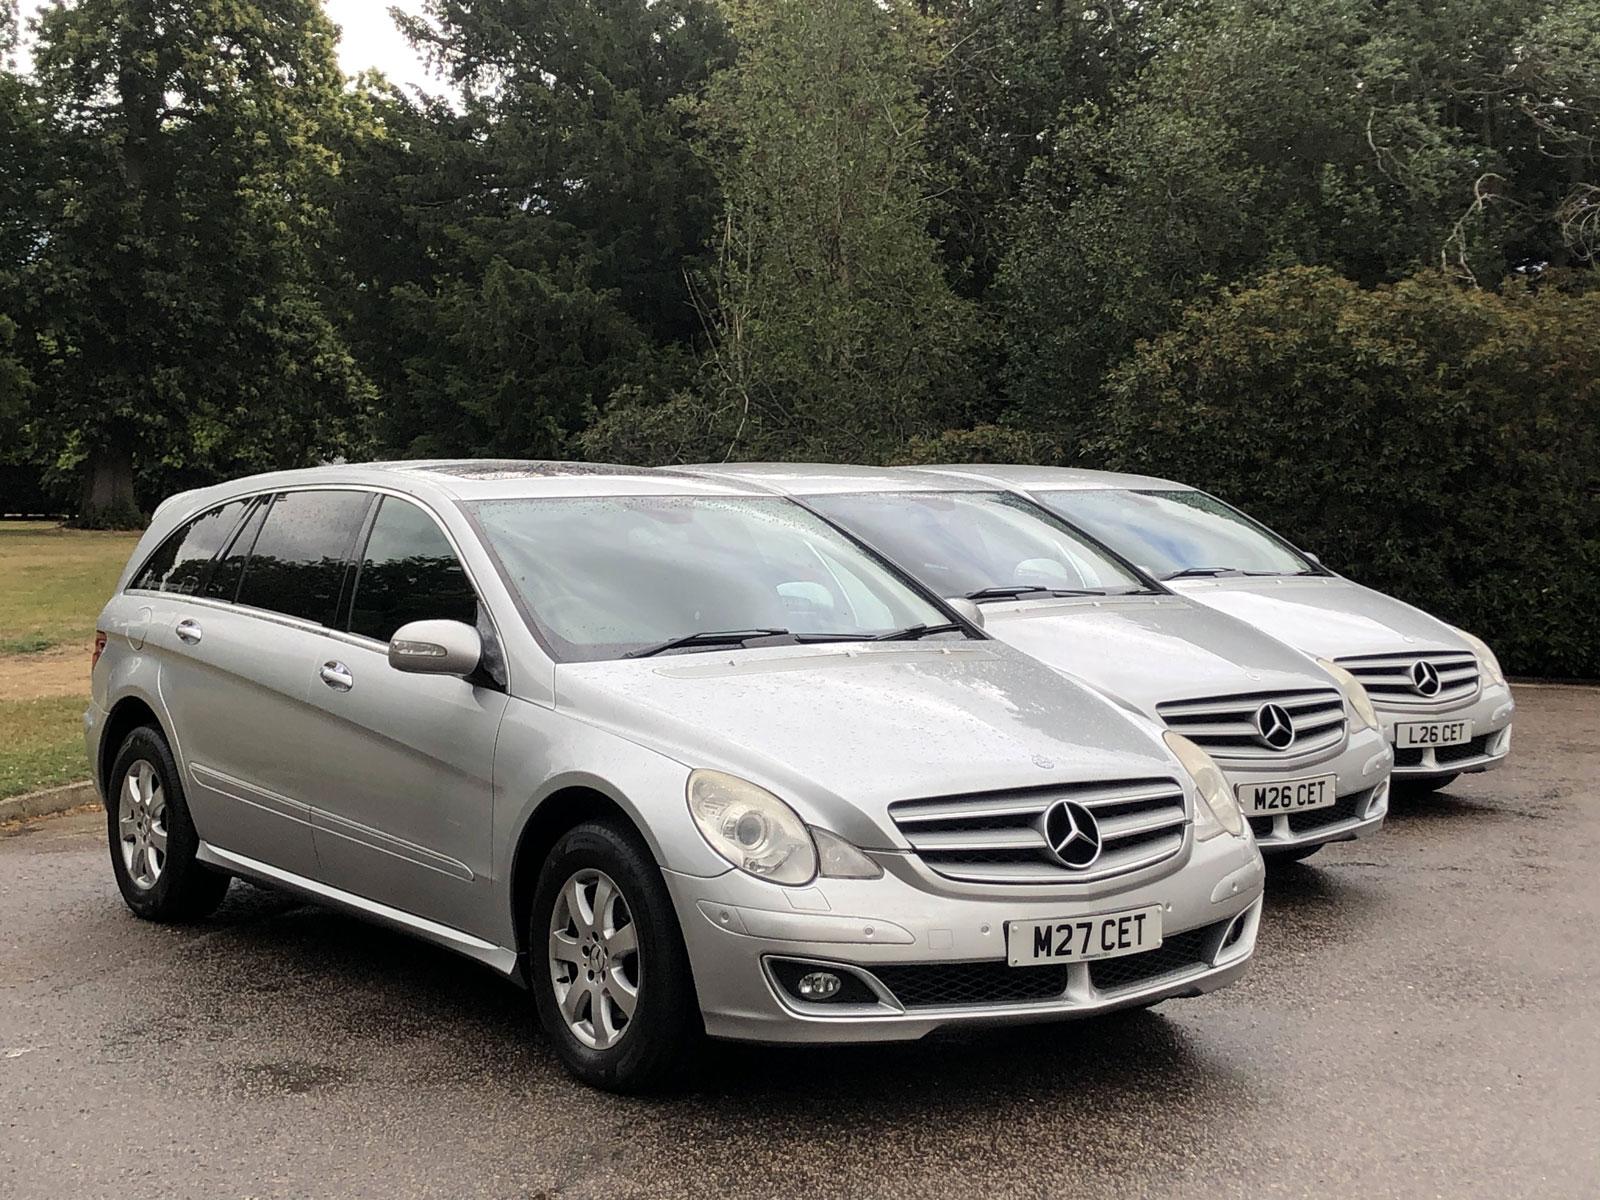 three claydon executive cars in a row